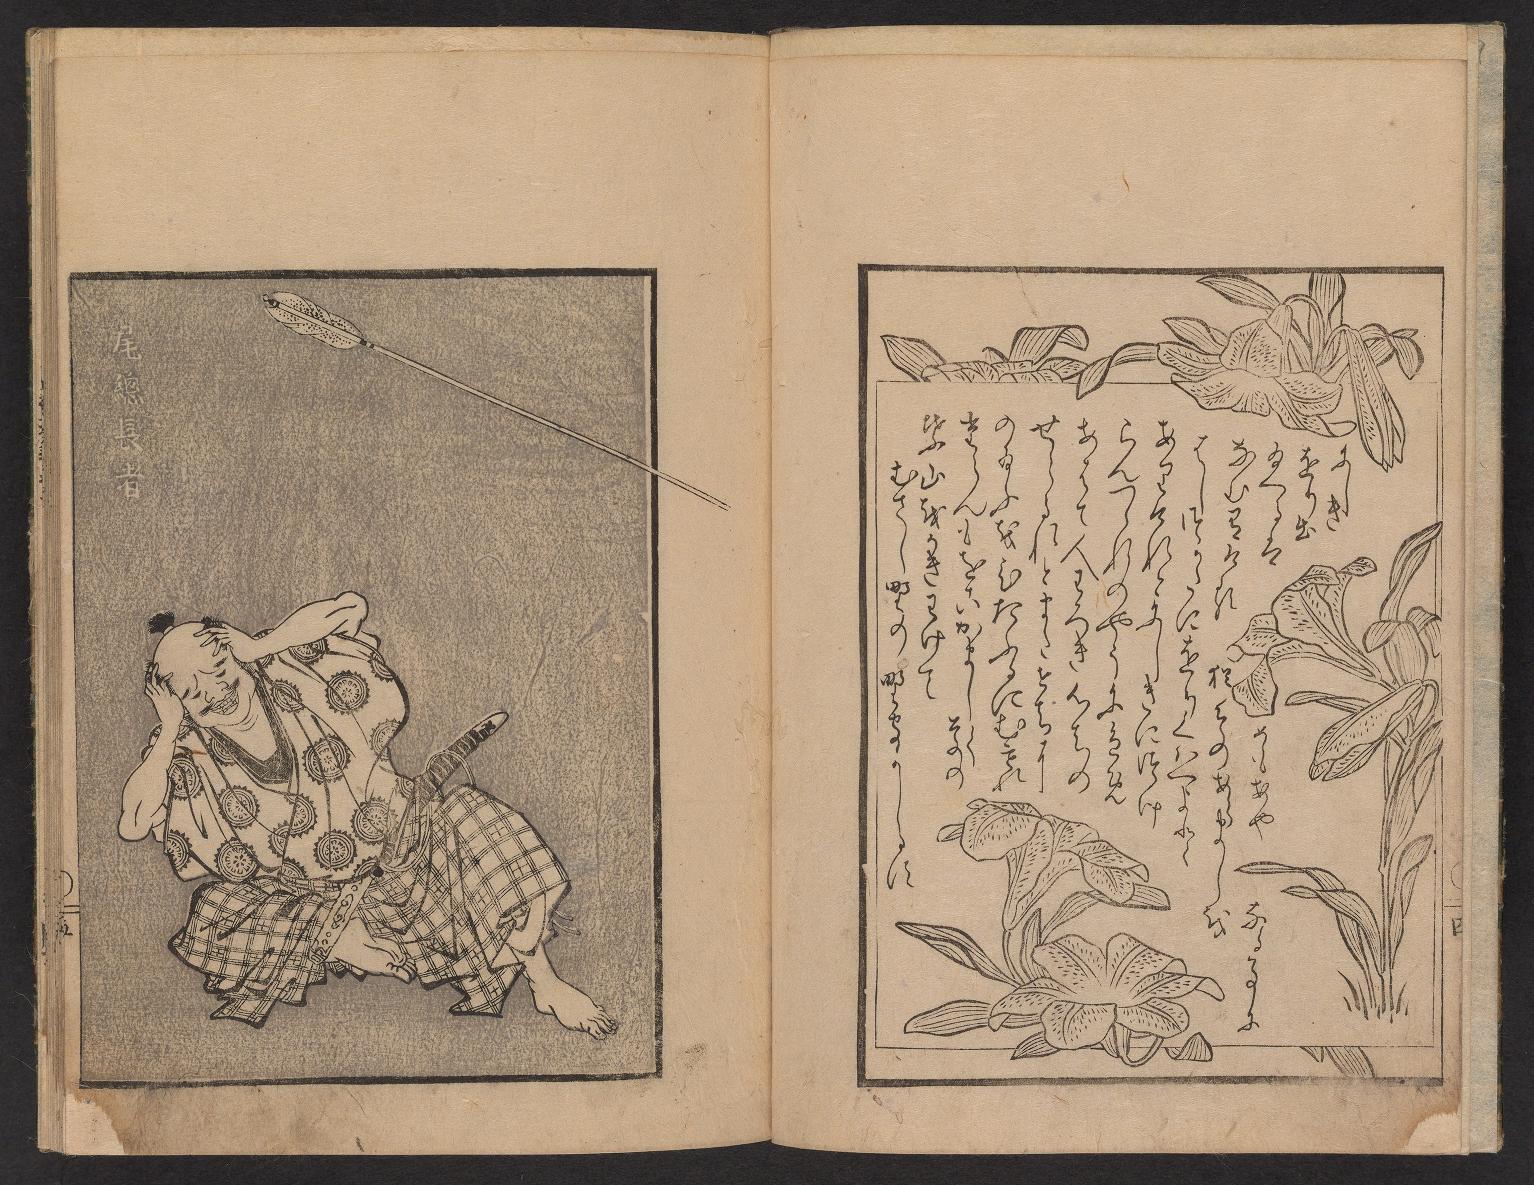 libri-illustrati-giapponesi-smithsonian-06